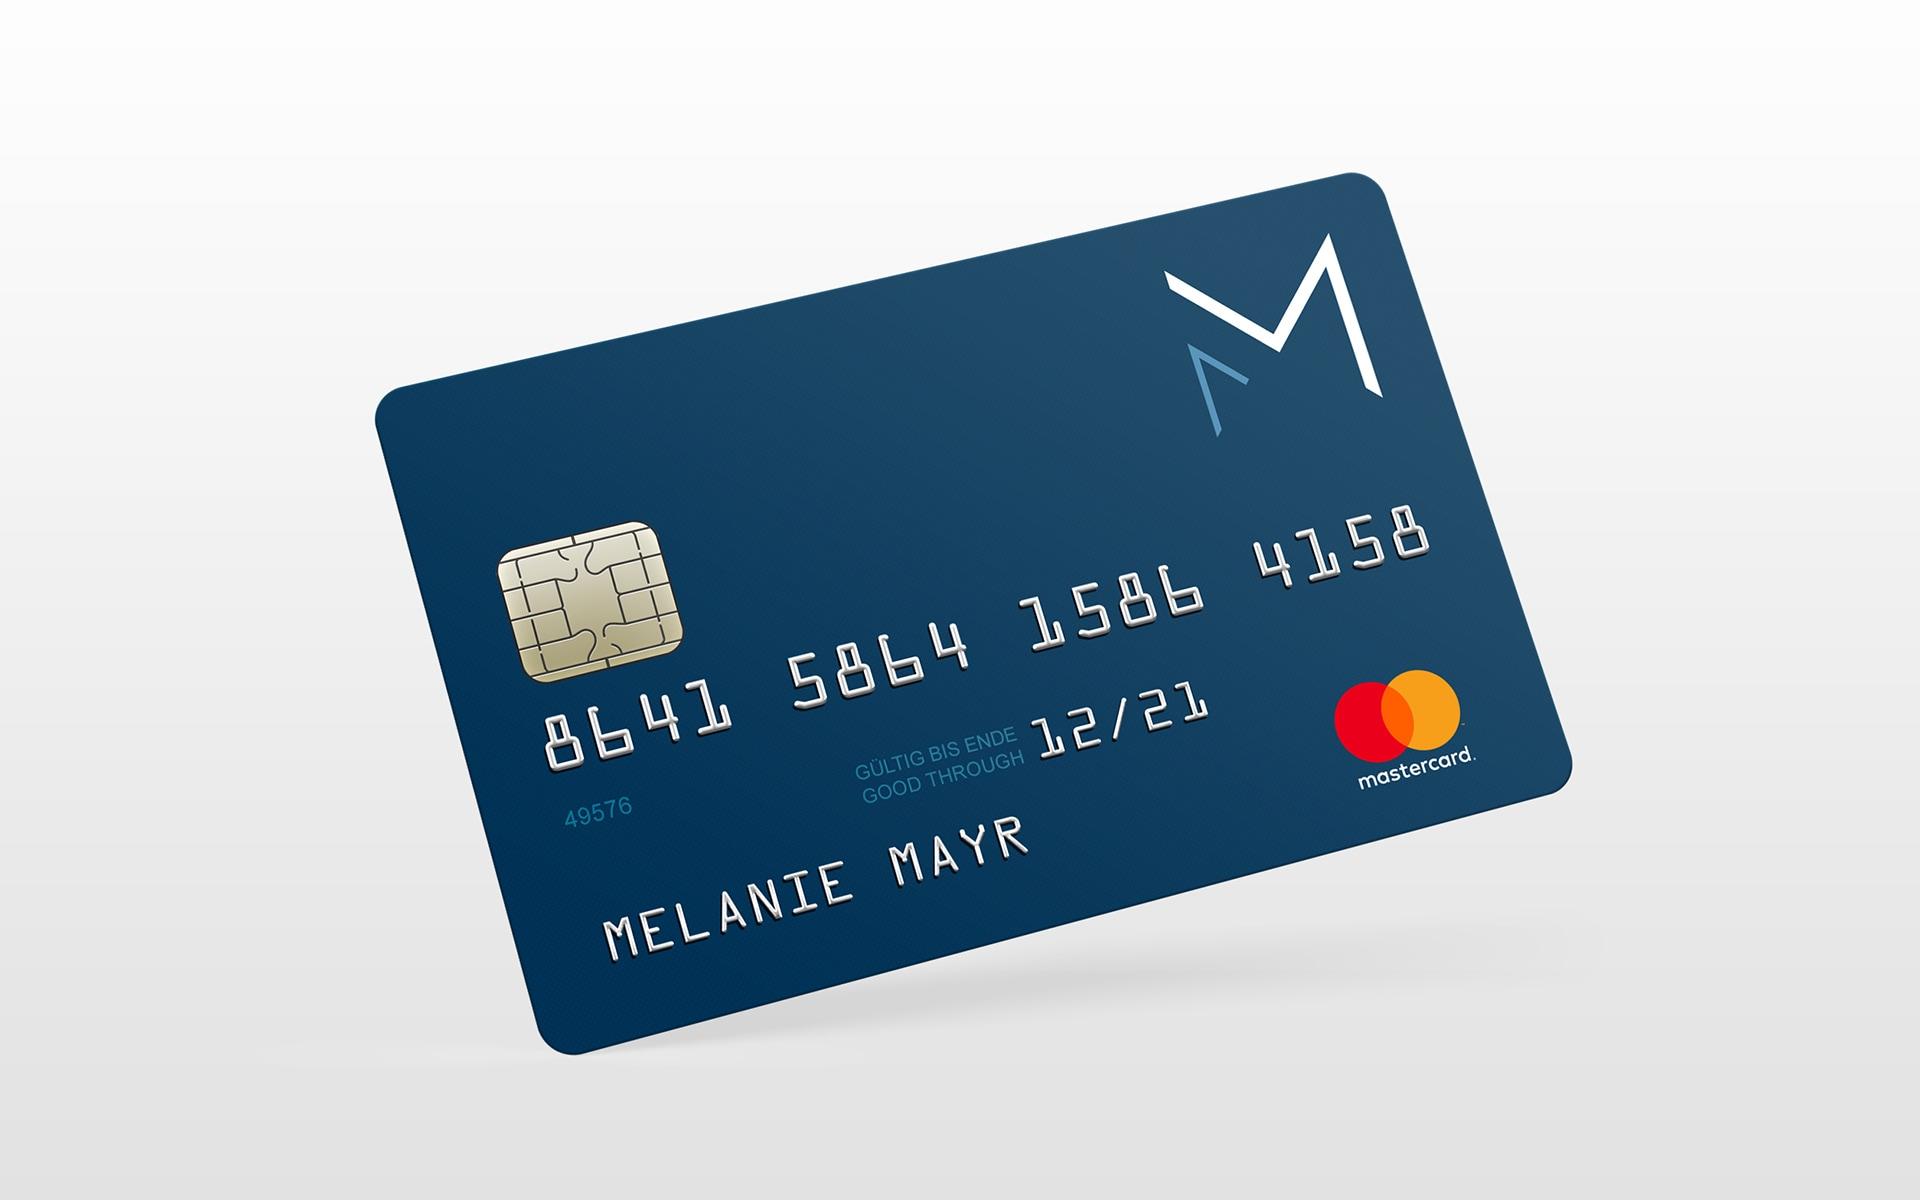 maxfath-ingenieurbuero-melanie-mayr-mering-branding-kreditkarte